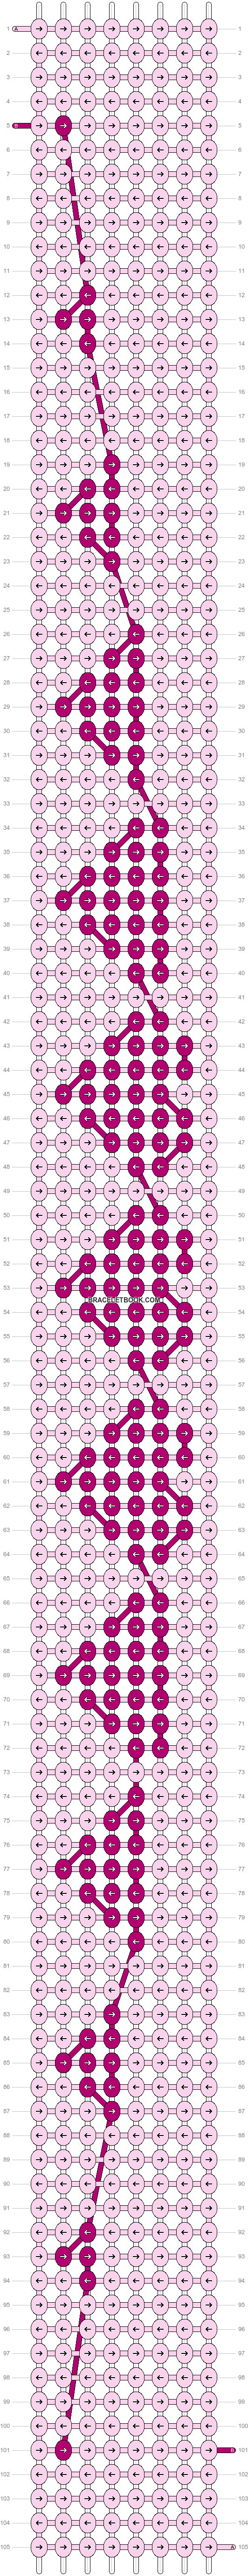 Alpha pattern #21593 pattern